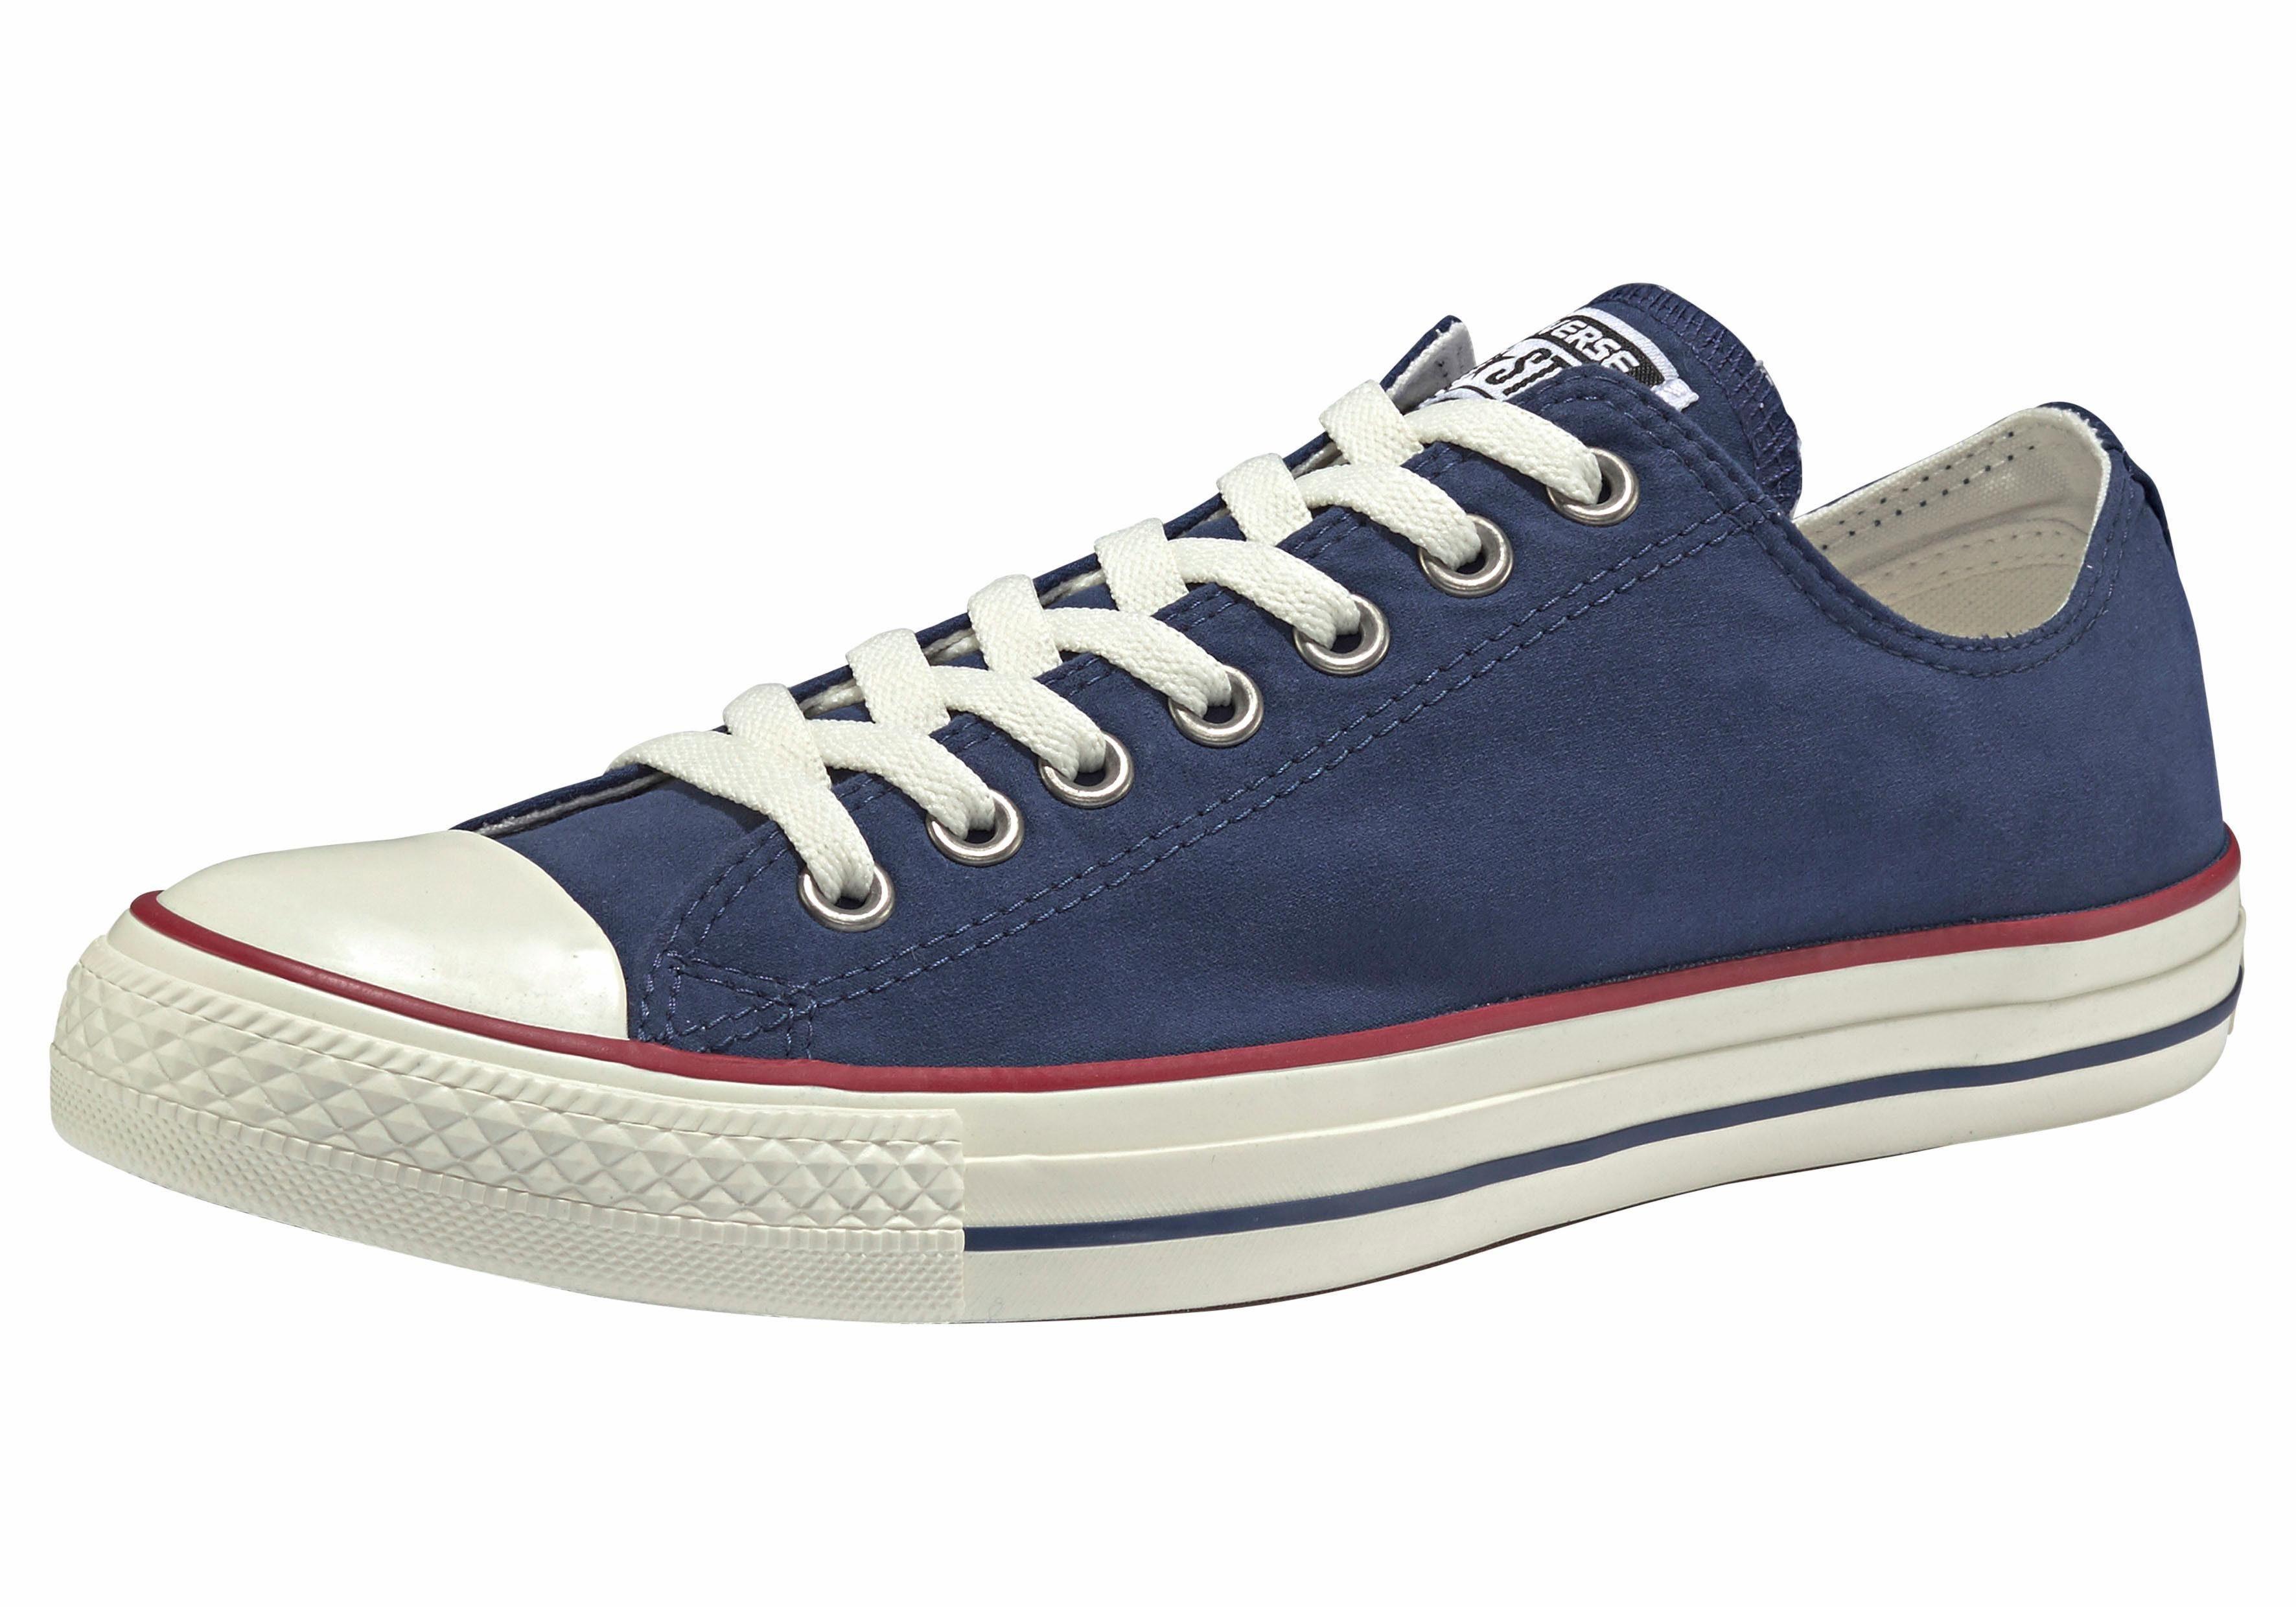 Converse Chuck Taylor All Star Ox Sneaker kaufen  dunkelblau